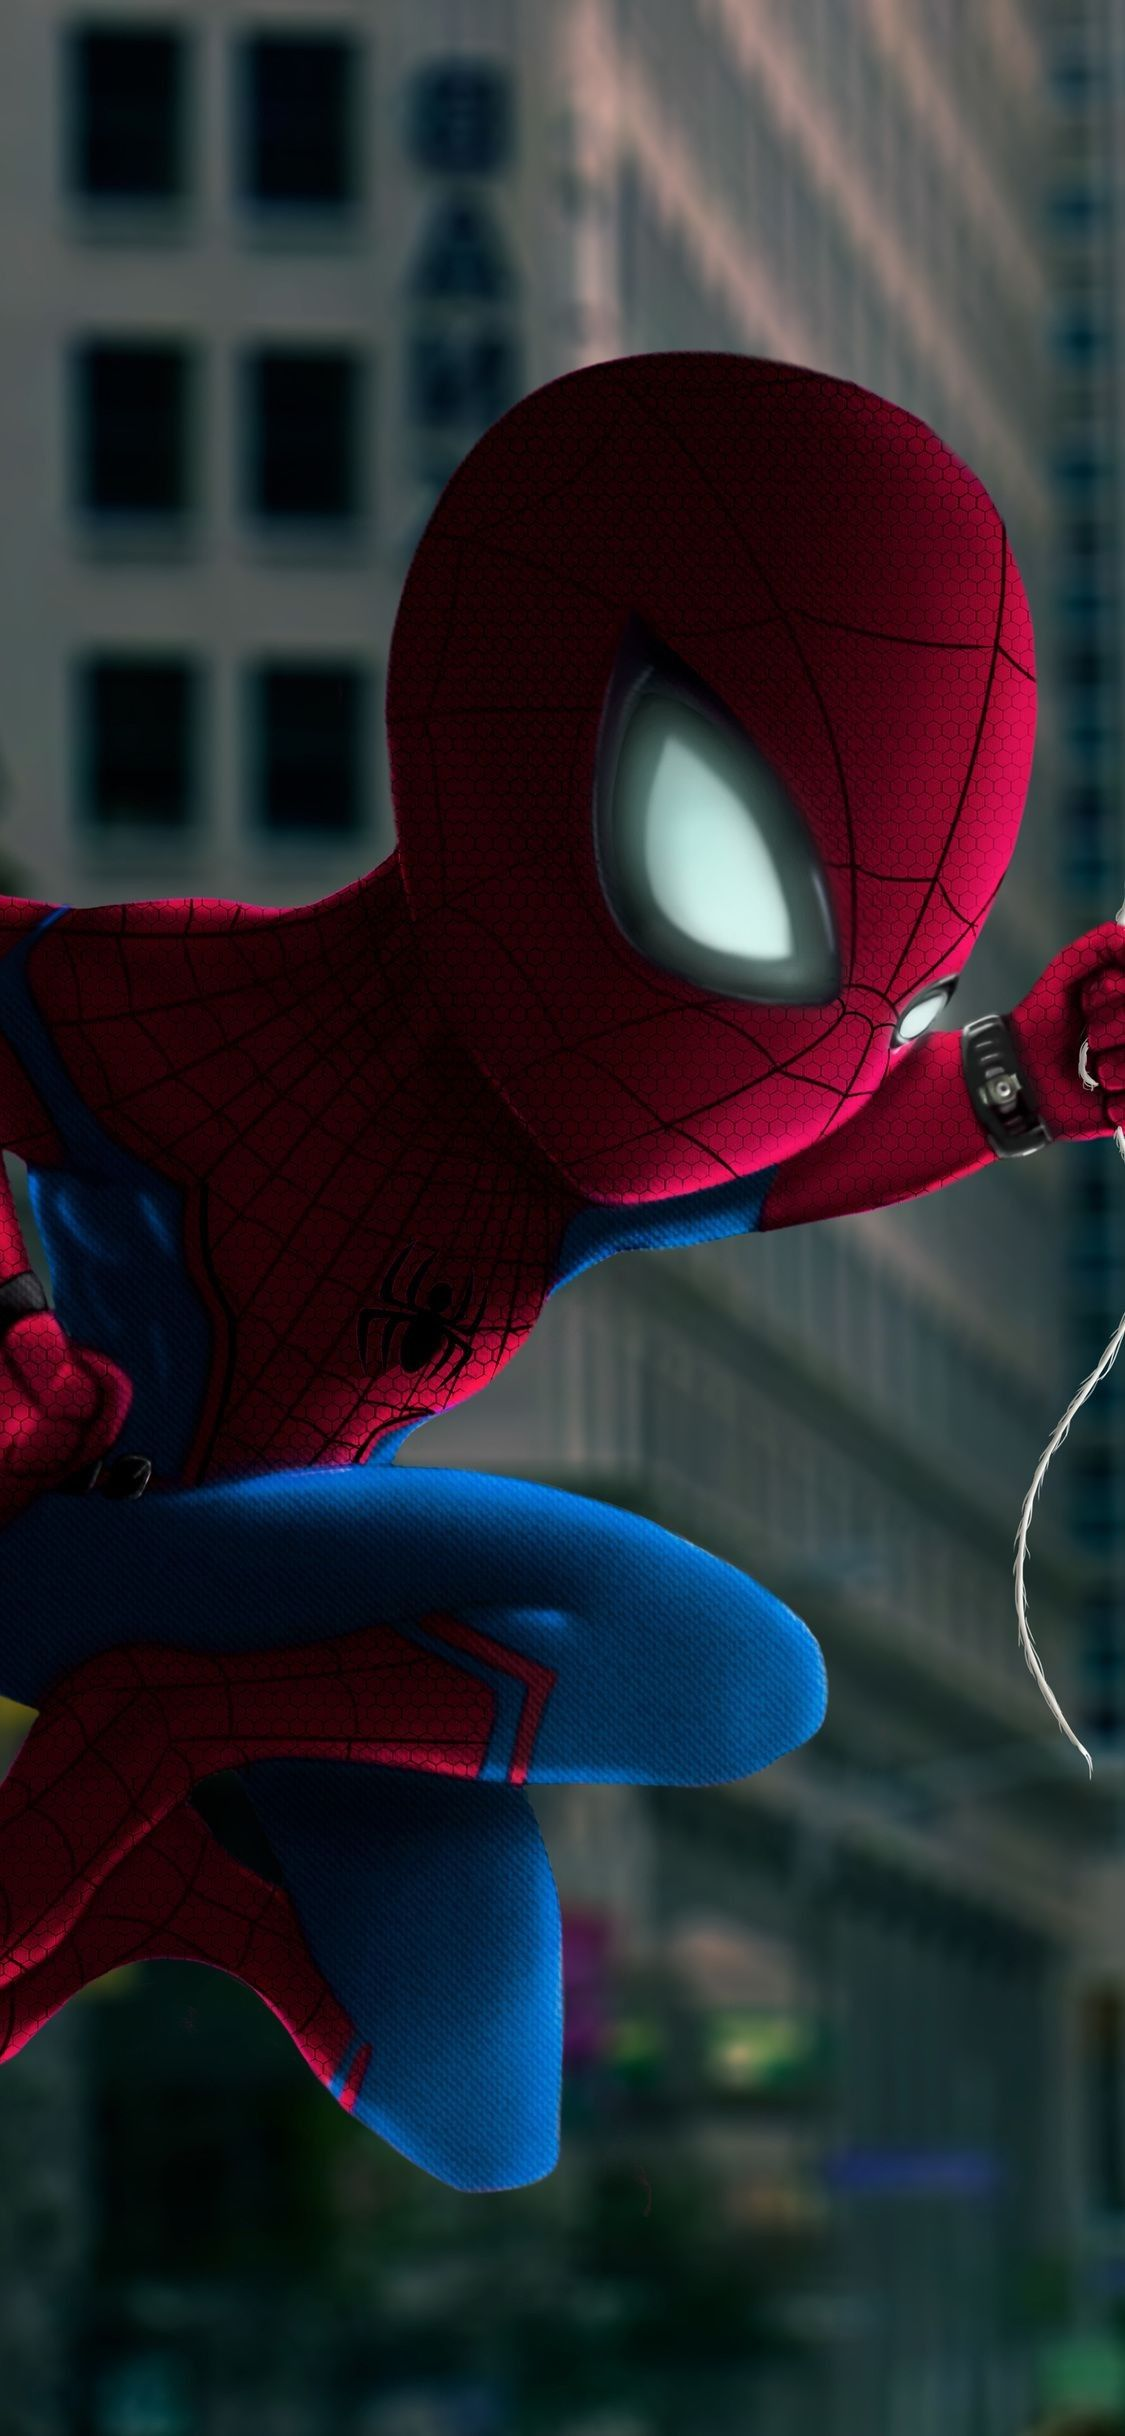 Inspirational Spiderman Live Wallpaper Iphone